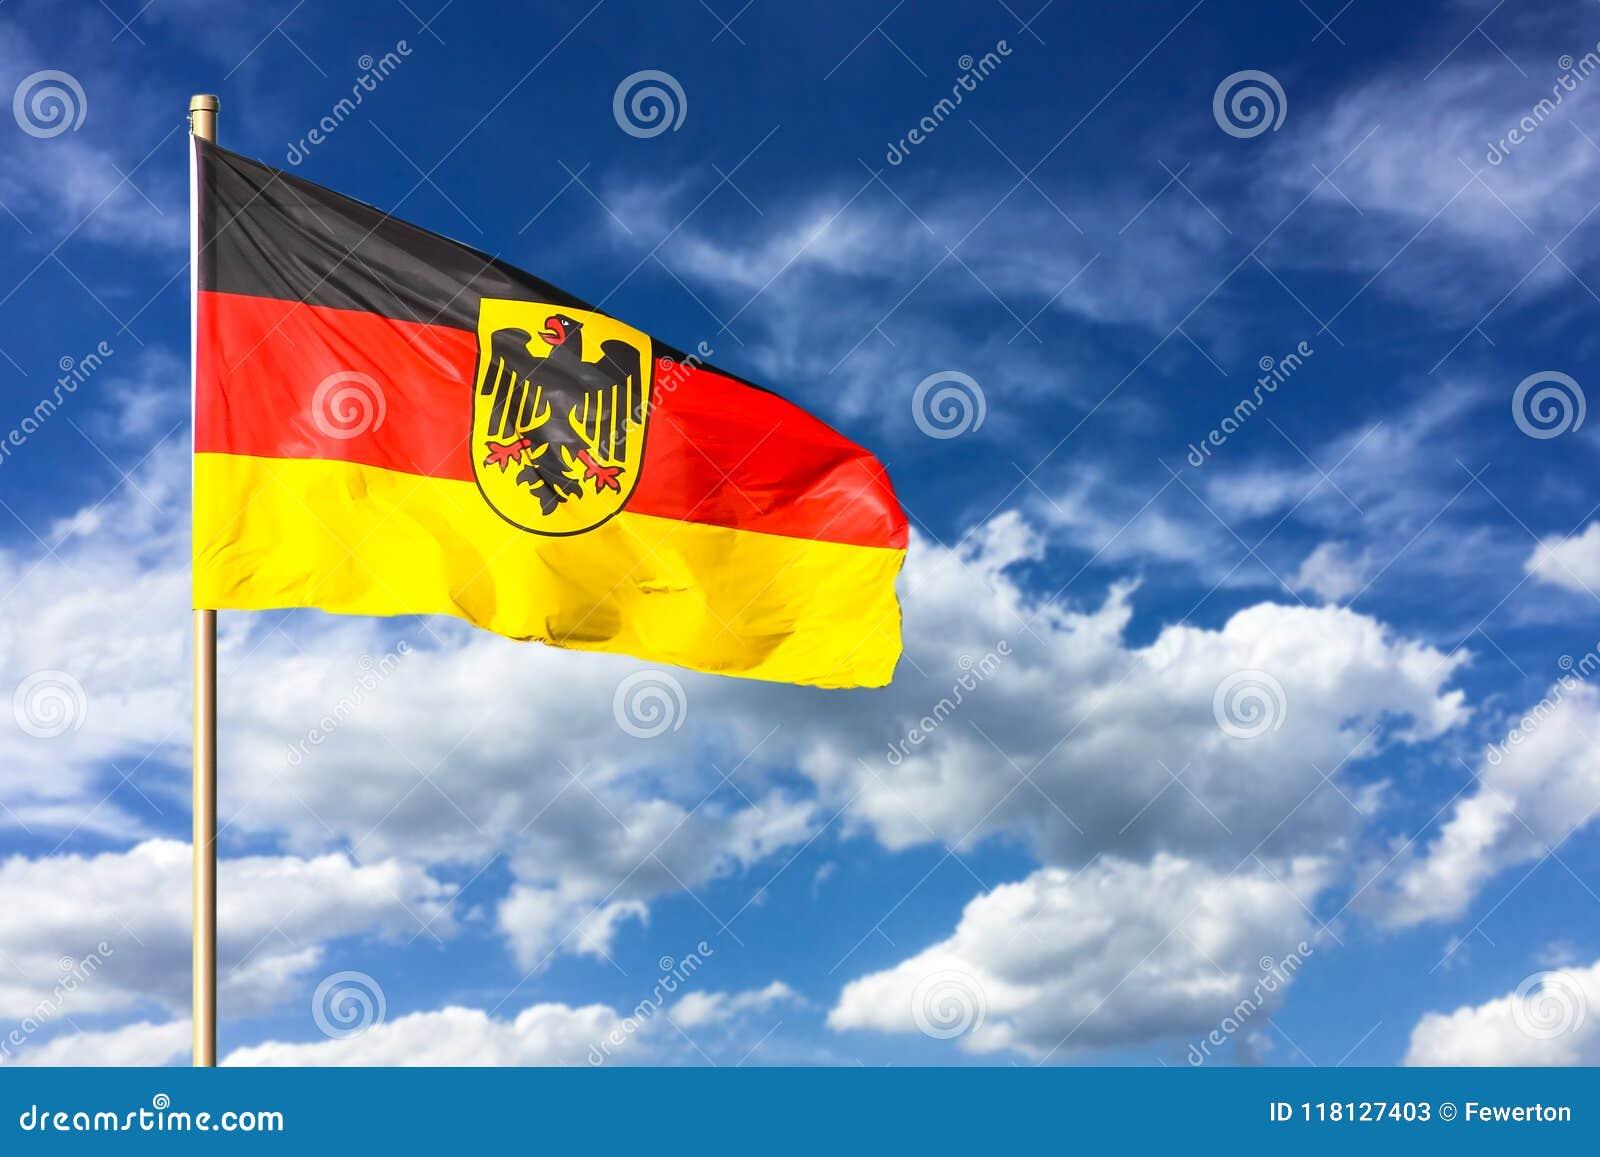 flag of germany federal republic of germany in german bundesrepublik deutschland waving in the. Black Bedroom Furniture Sets. Home Design Ideas